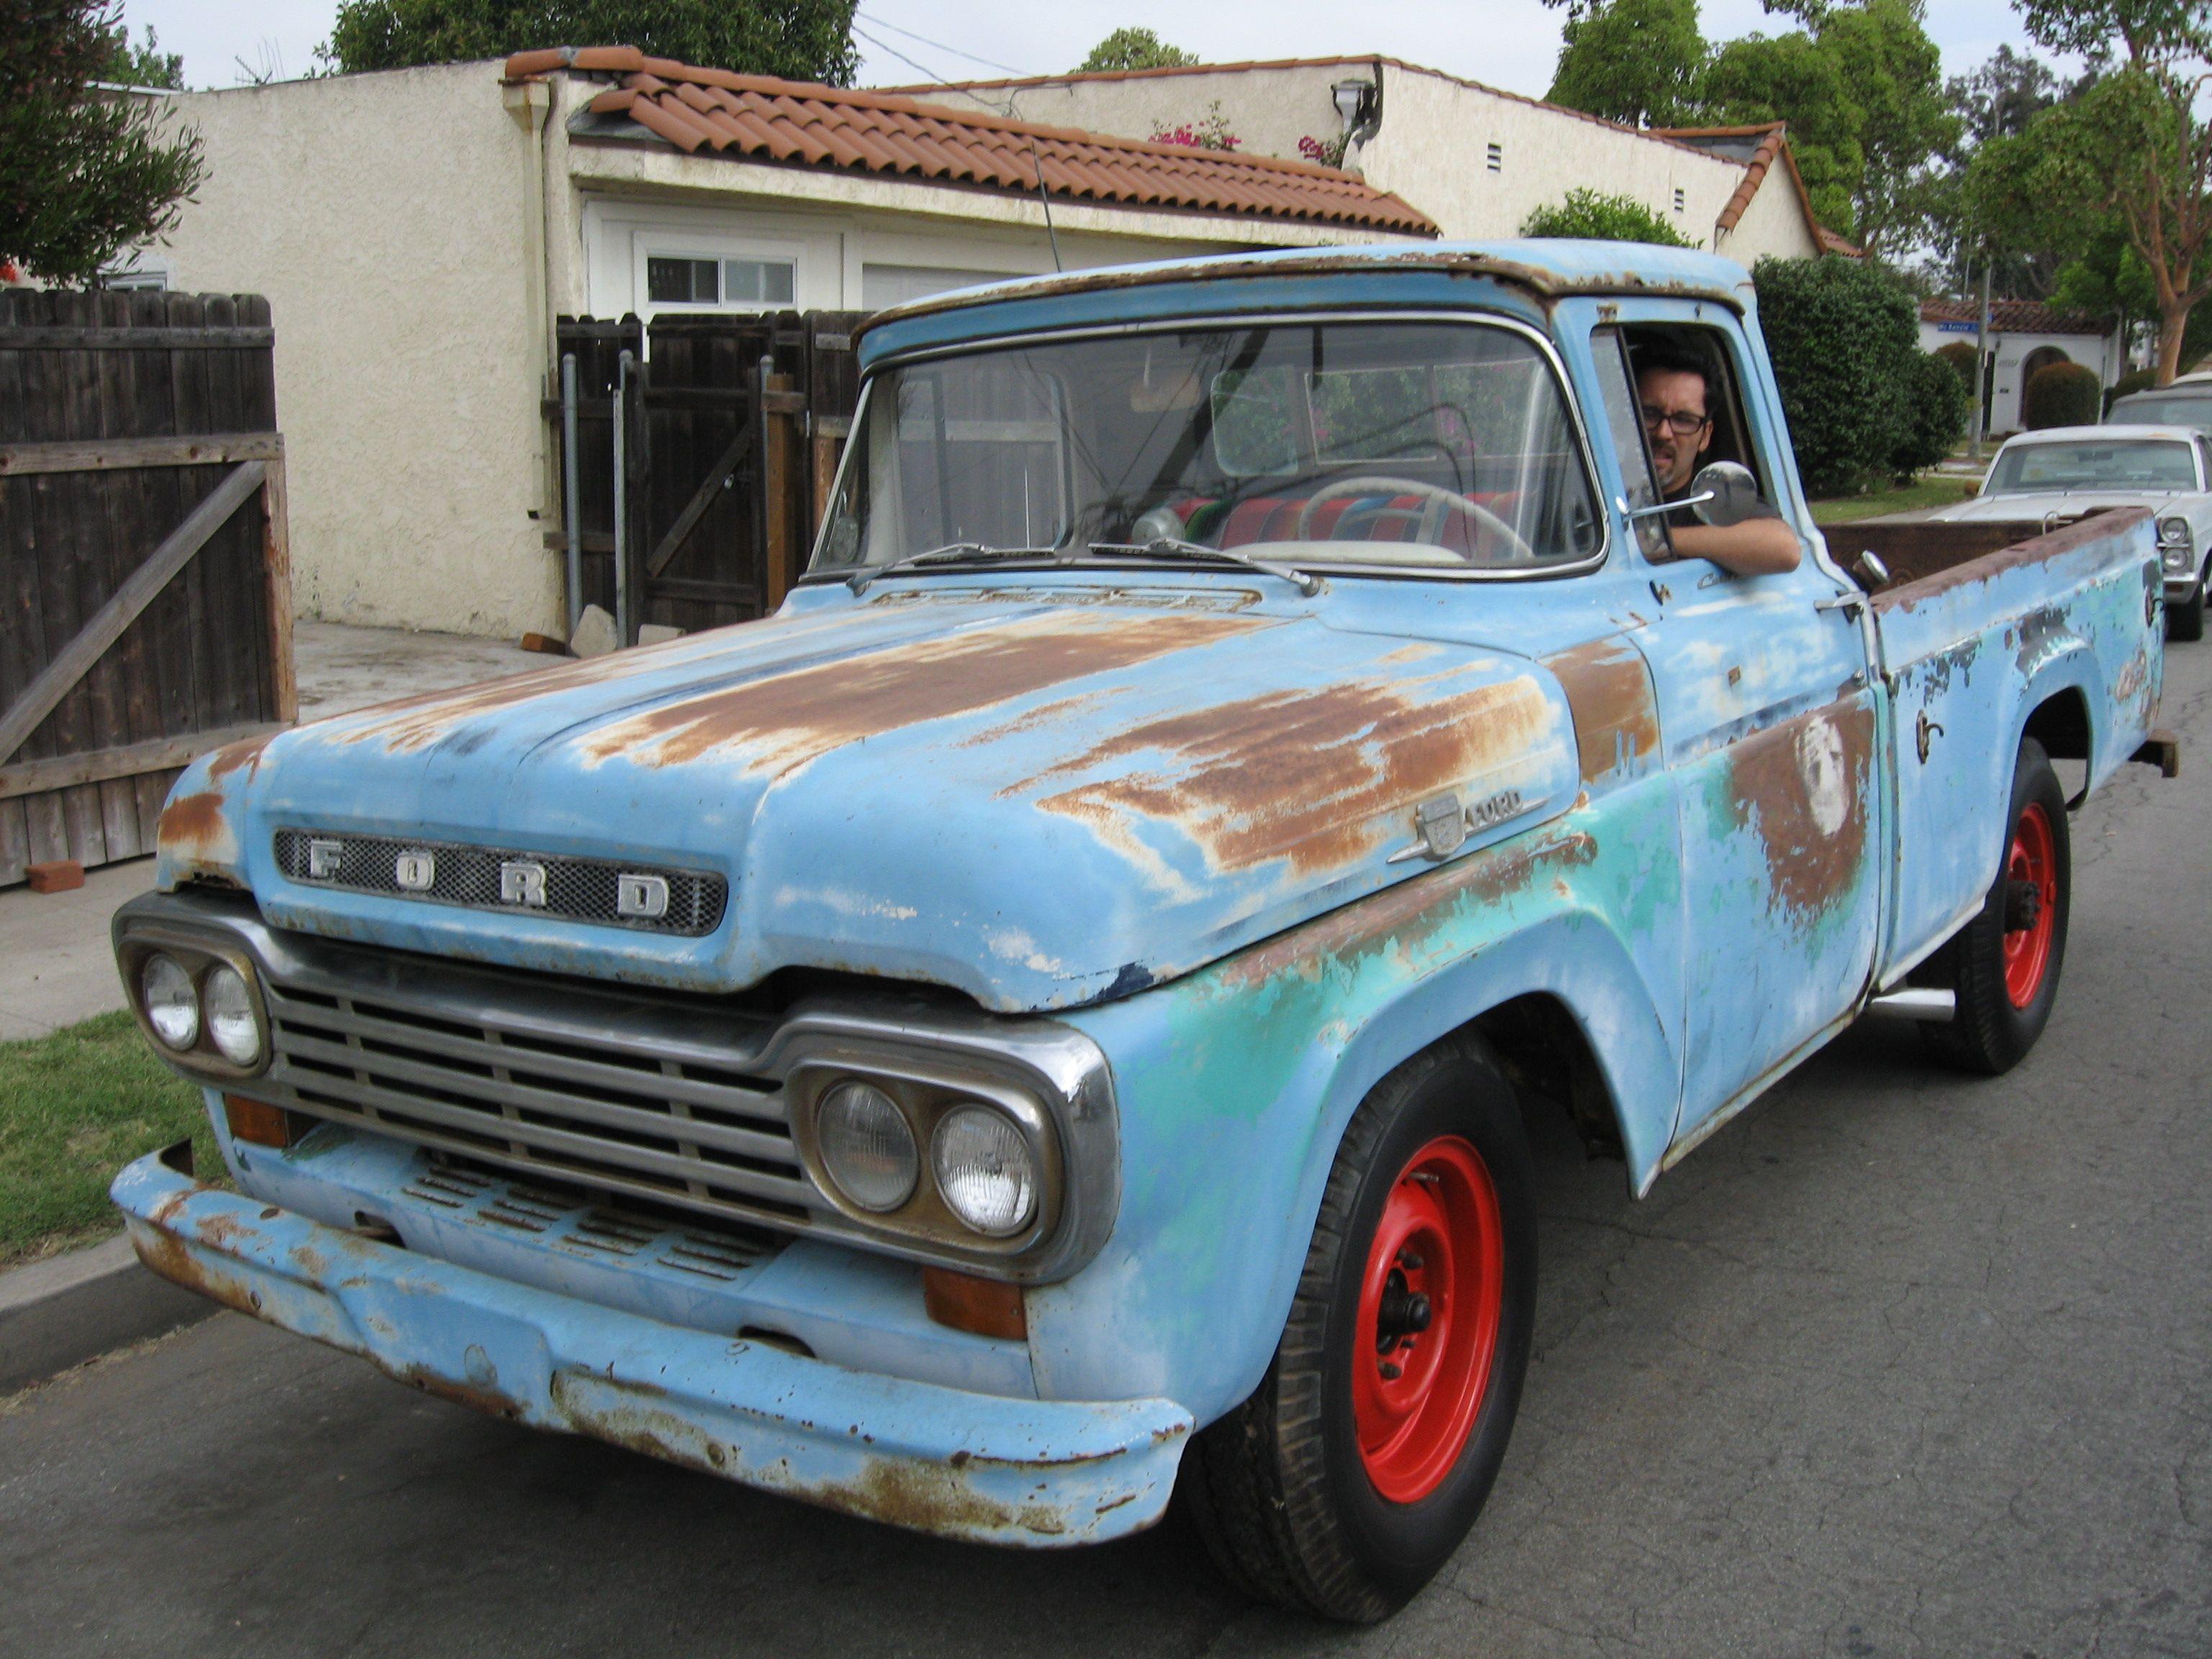 Pin by Kingofkings413 on 20s-50\'s Ford Trucks | Pinterest | Ford ...